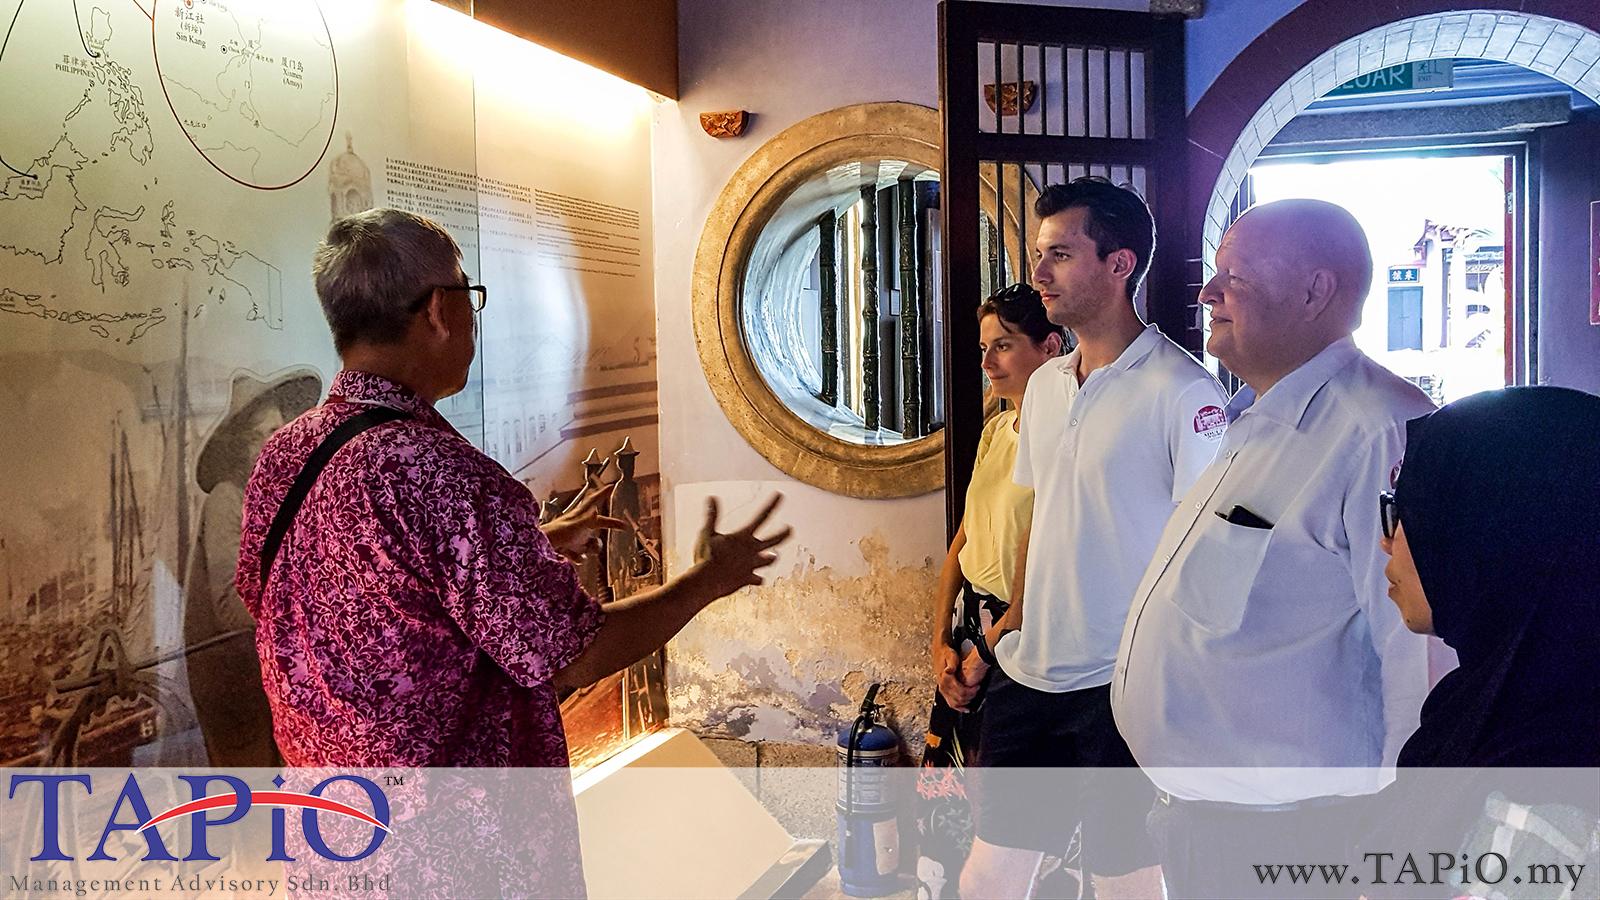 Penang Business Trip - 14/07/2019